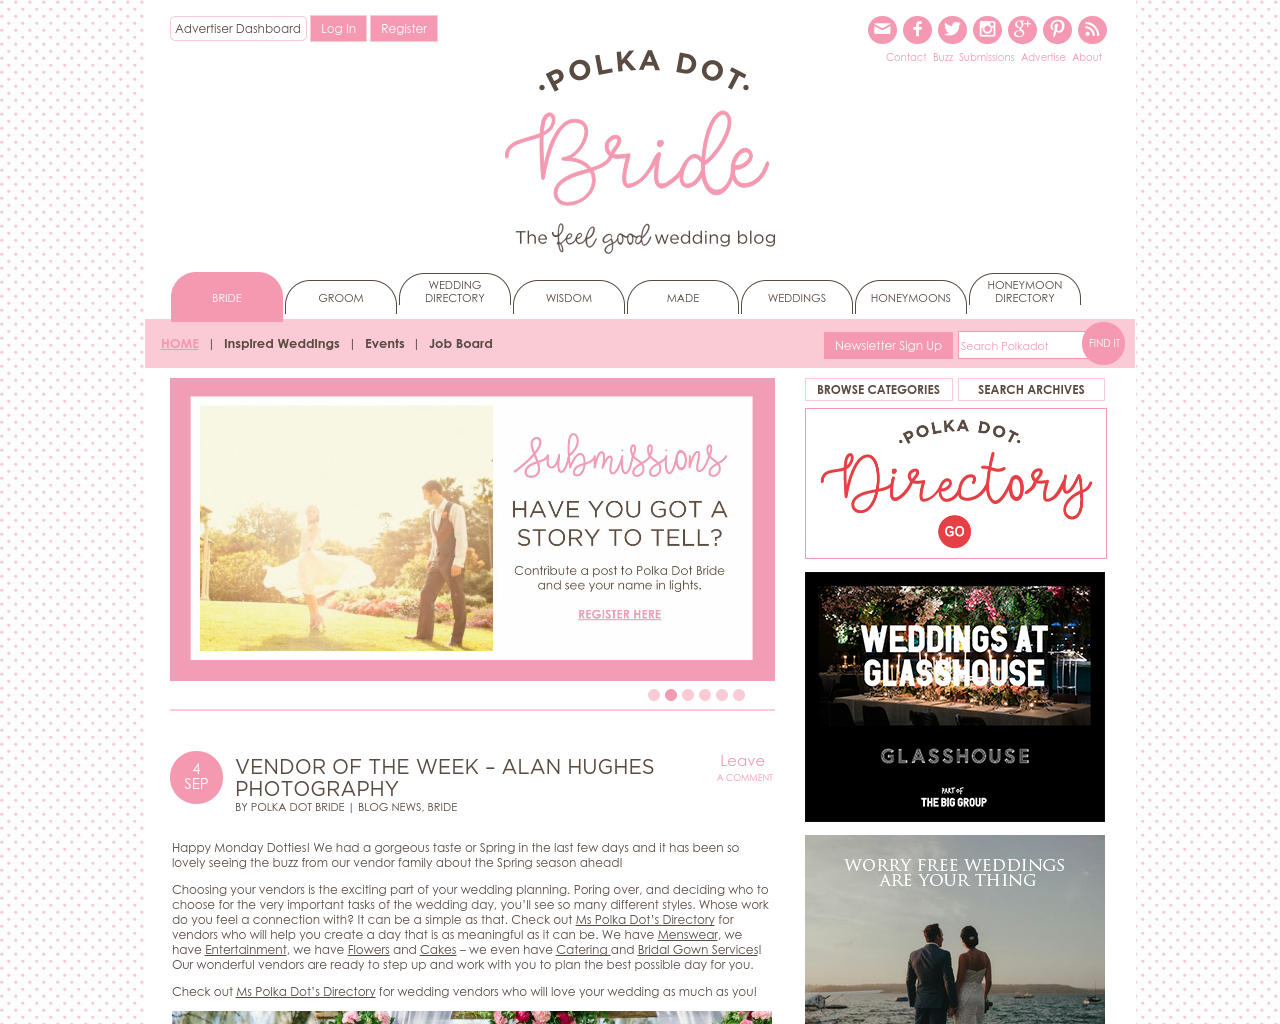 Polka-Dot-Bridge-Advertising-Reviews-Pricing